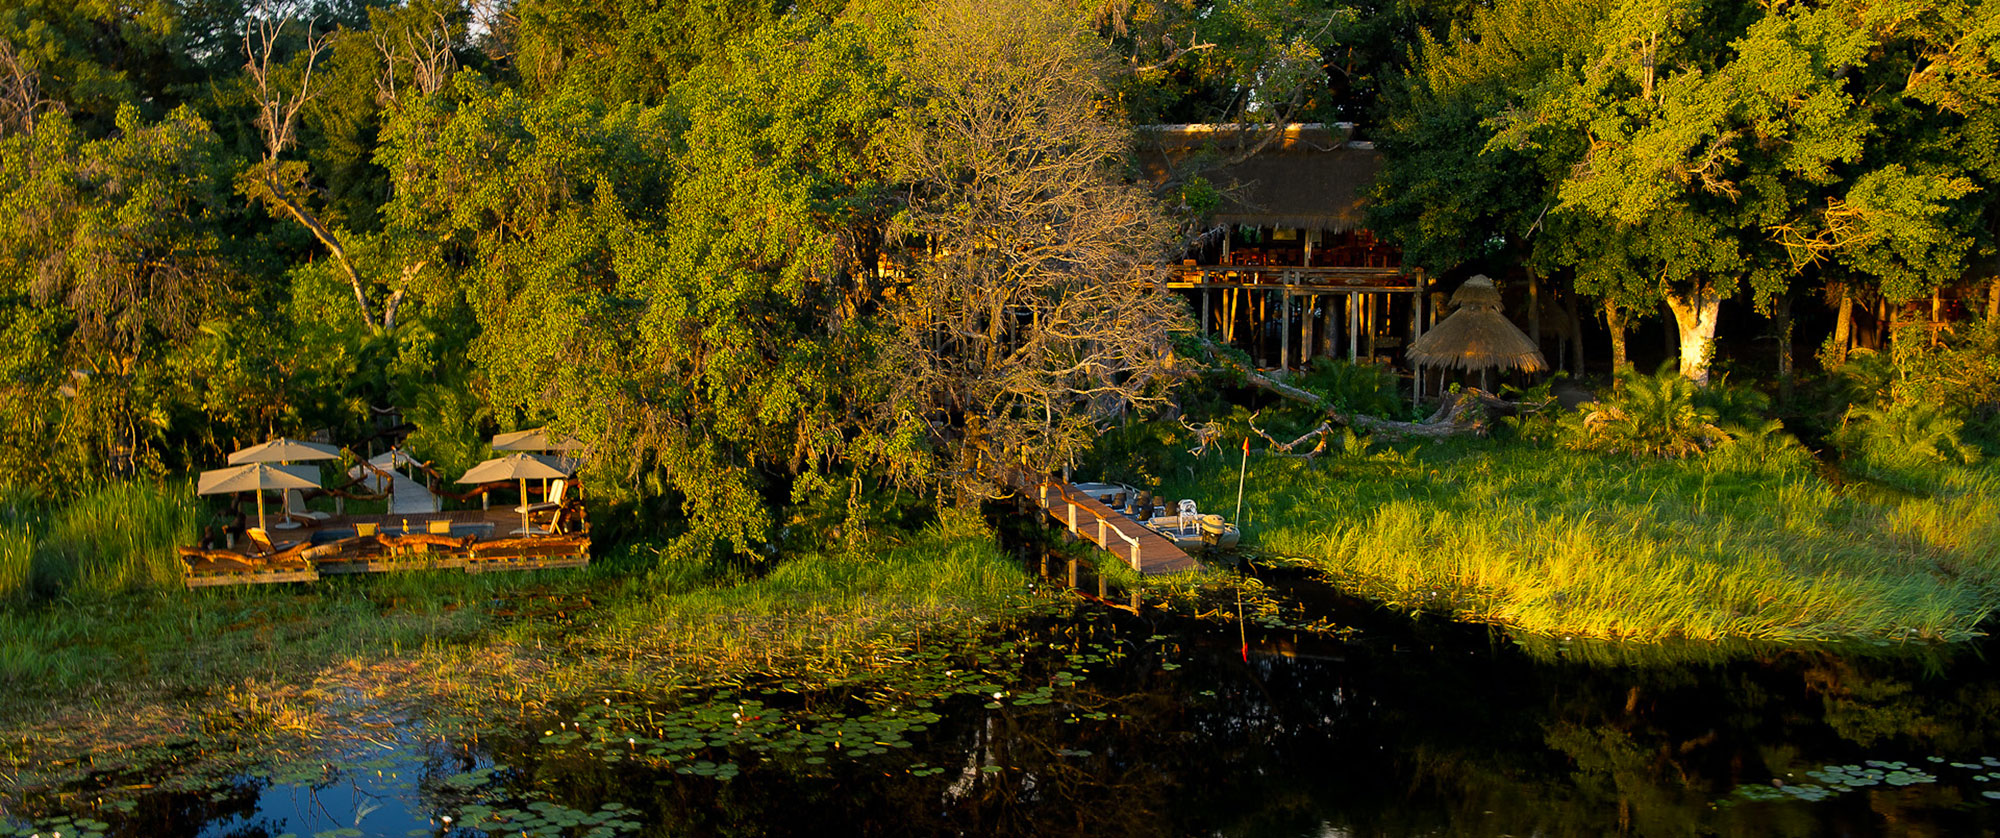 Okavango Delta Packages - Luxury Safari - Jao Camp Exterior